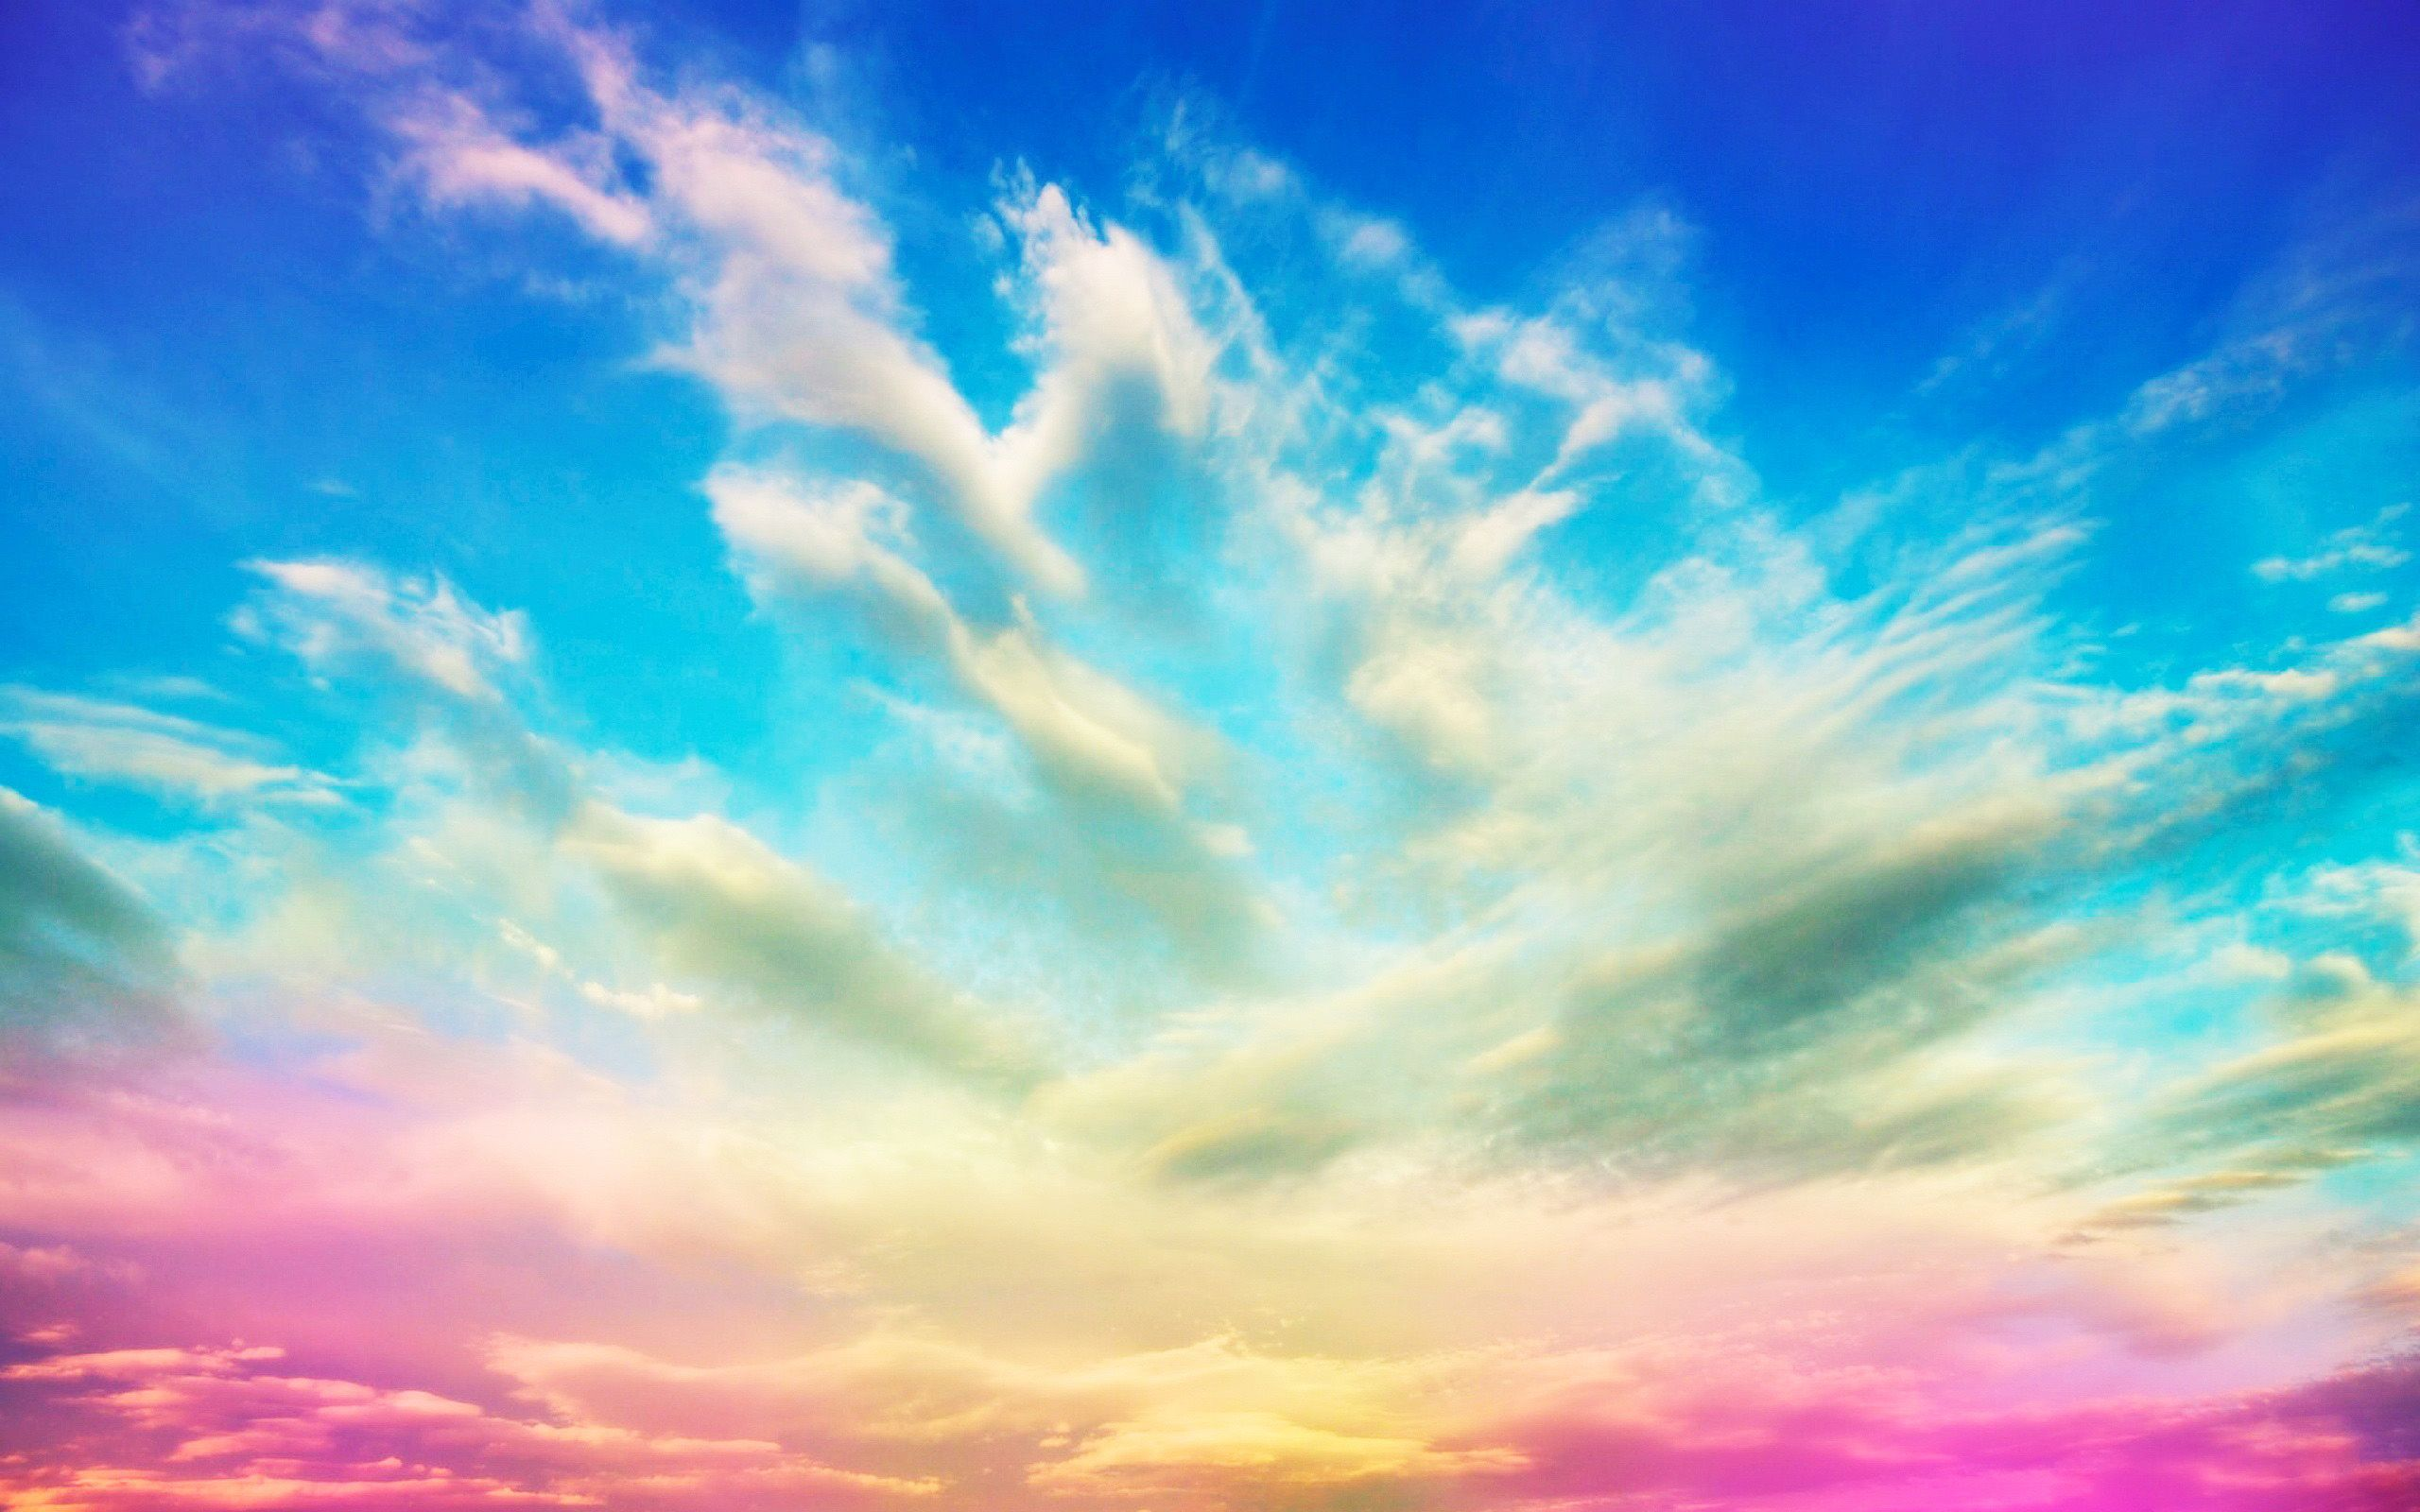 Colorful Cloud Wallpaper | www.pixshark.com - Images ...